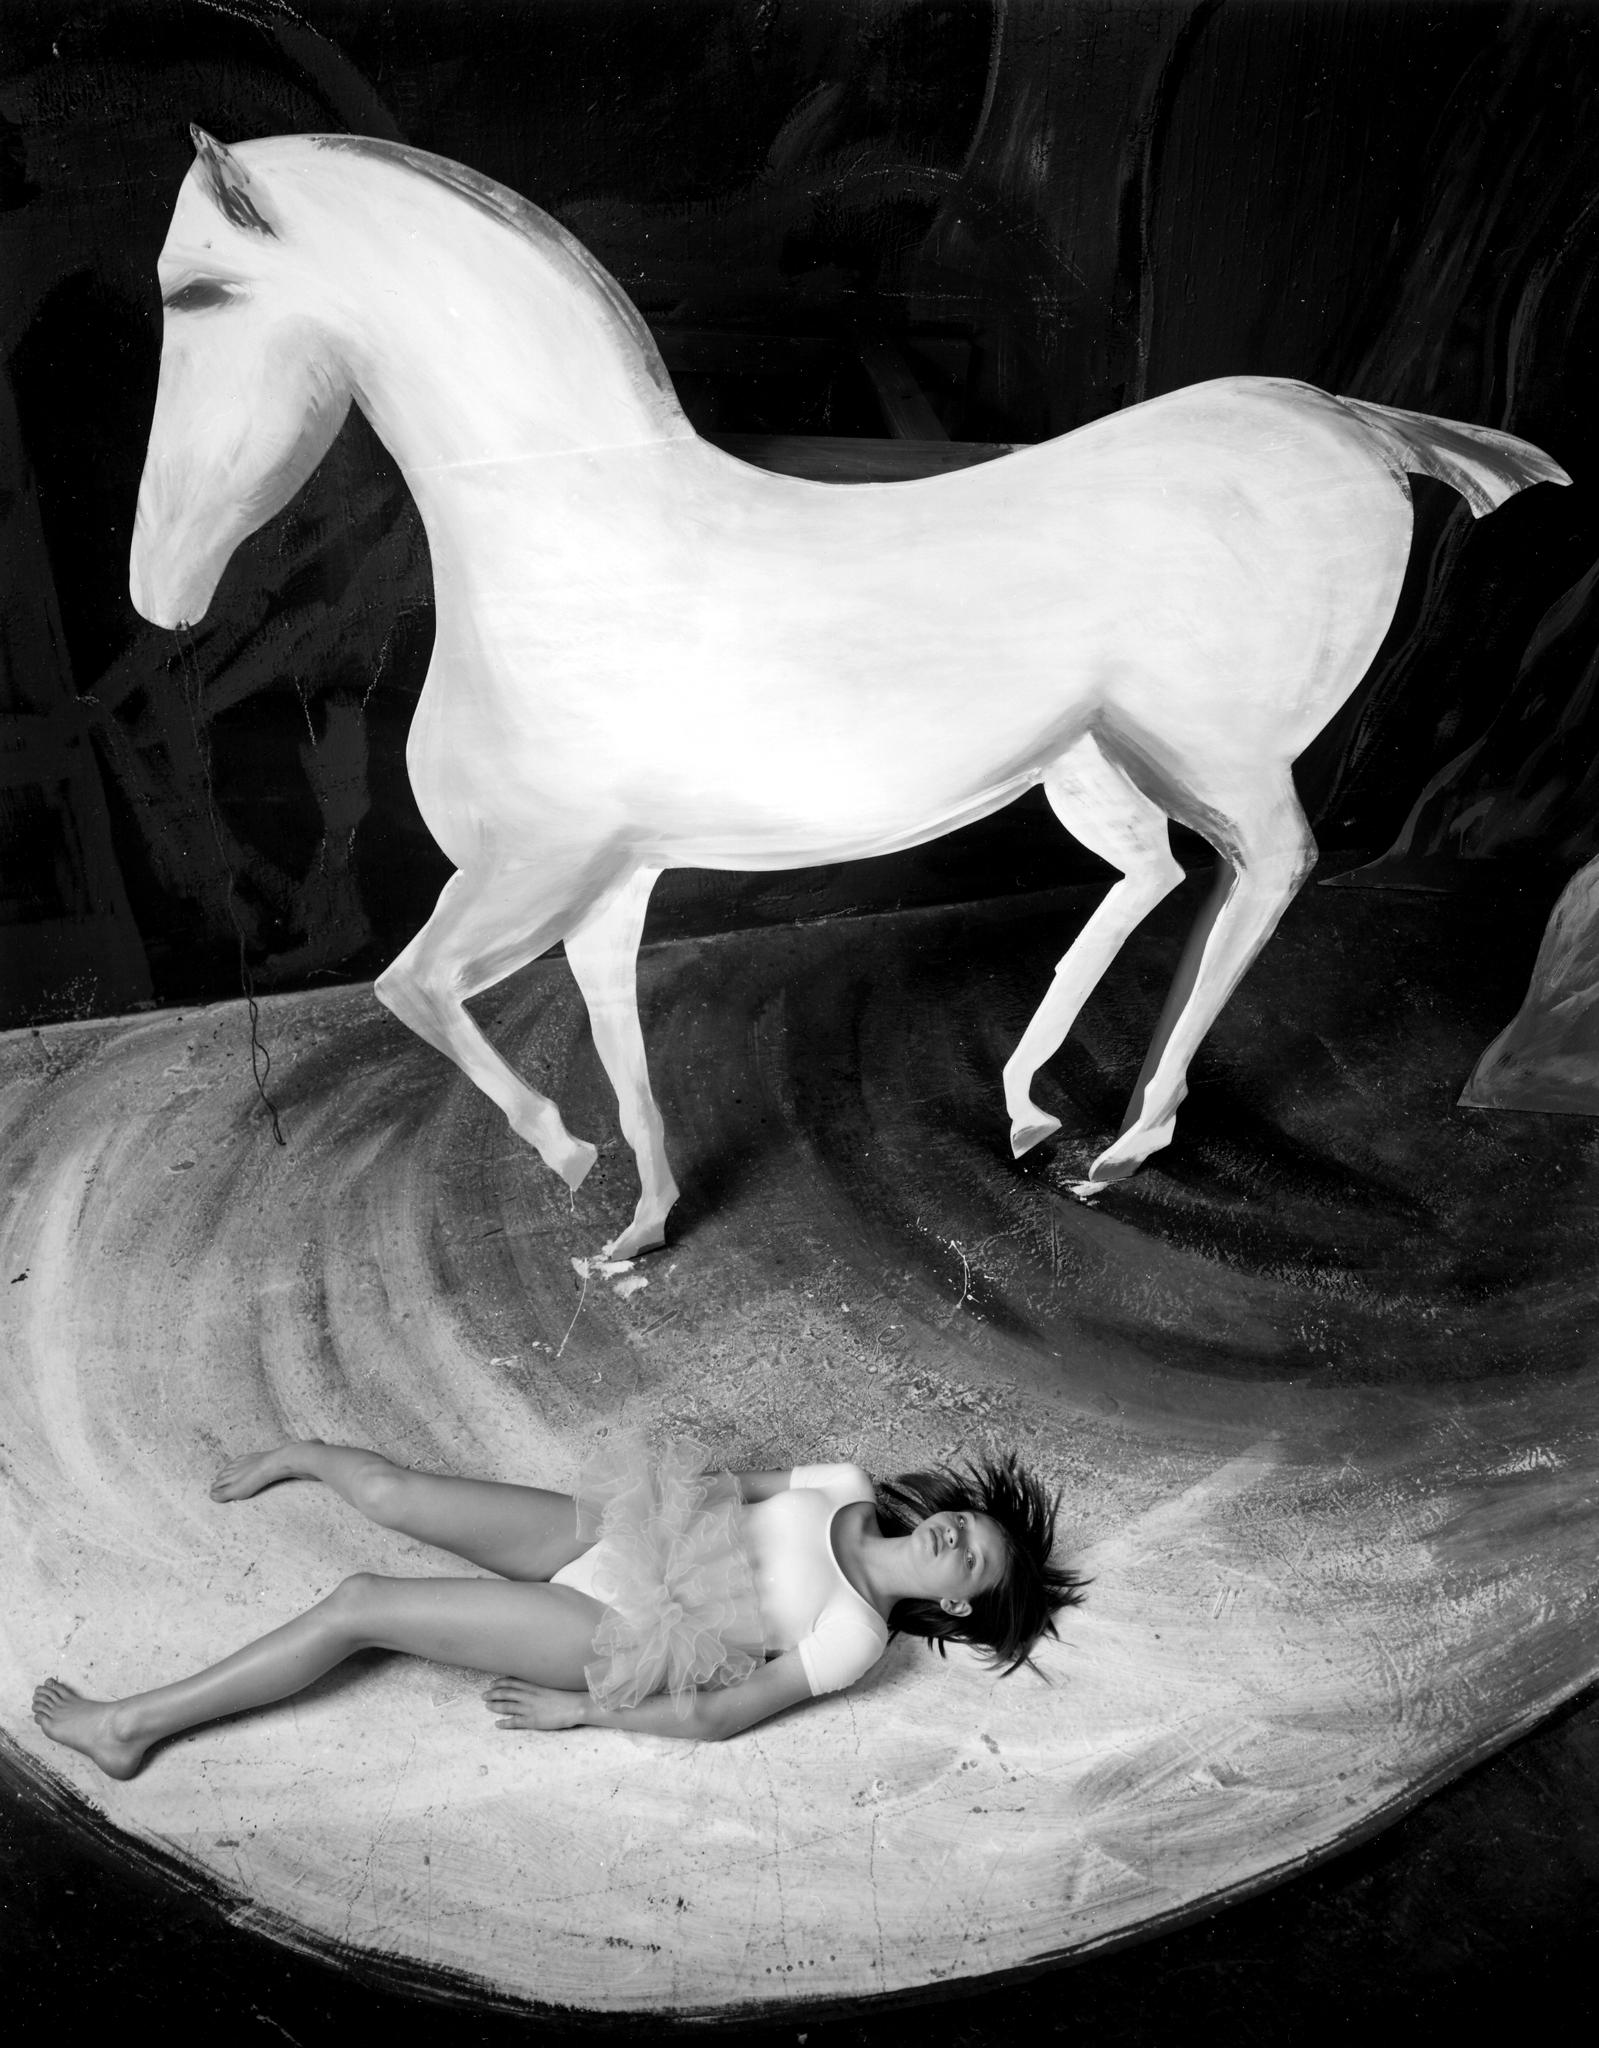 """Lauren and Horse"" by Kim Weston"